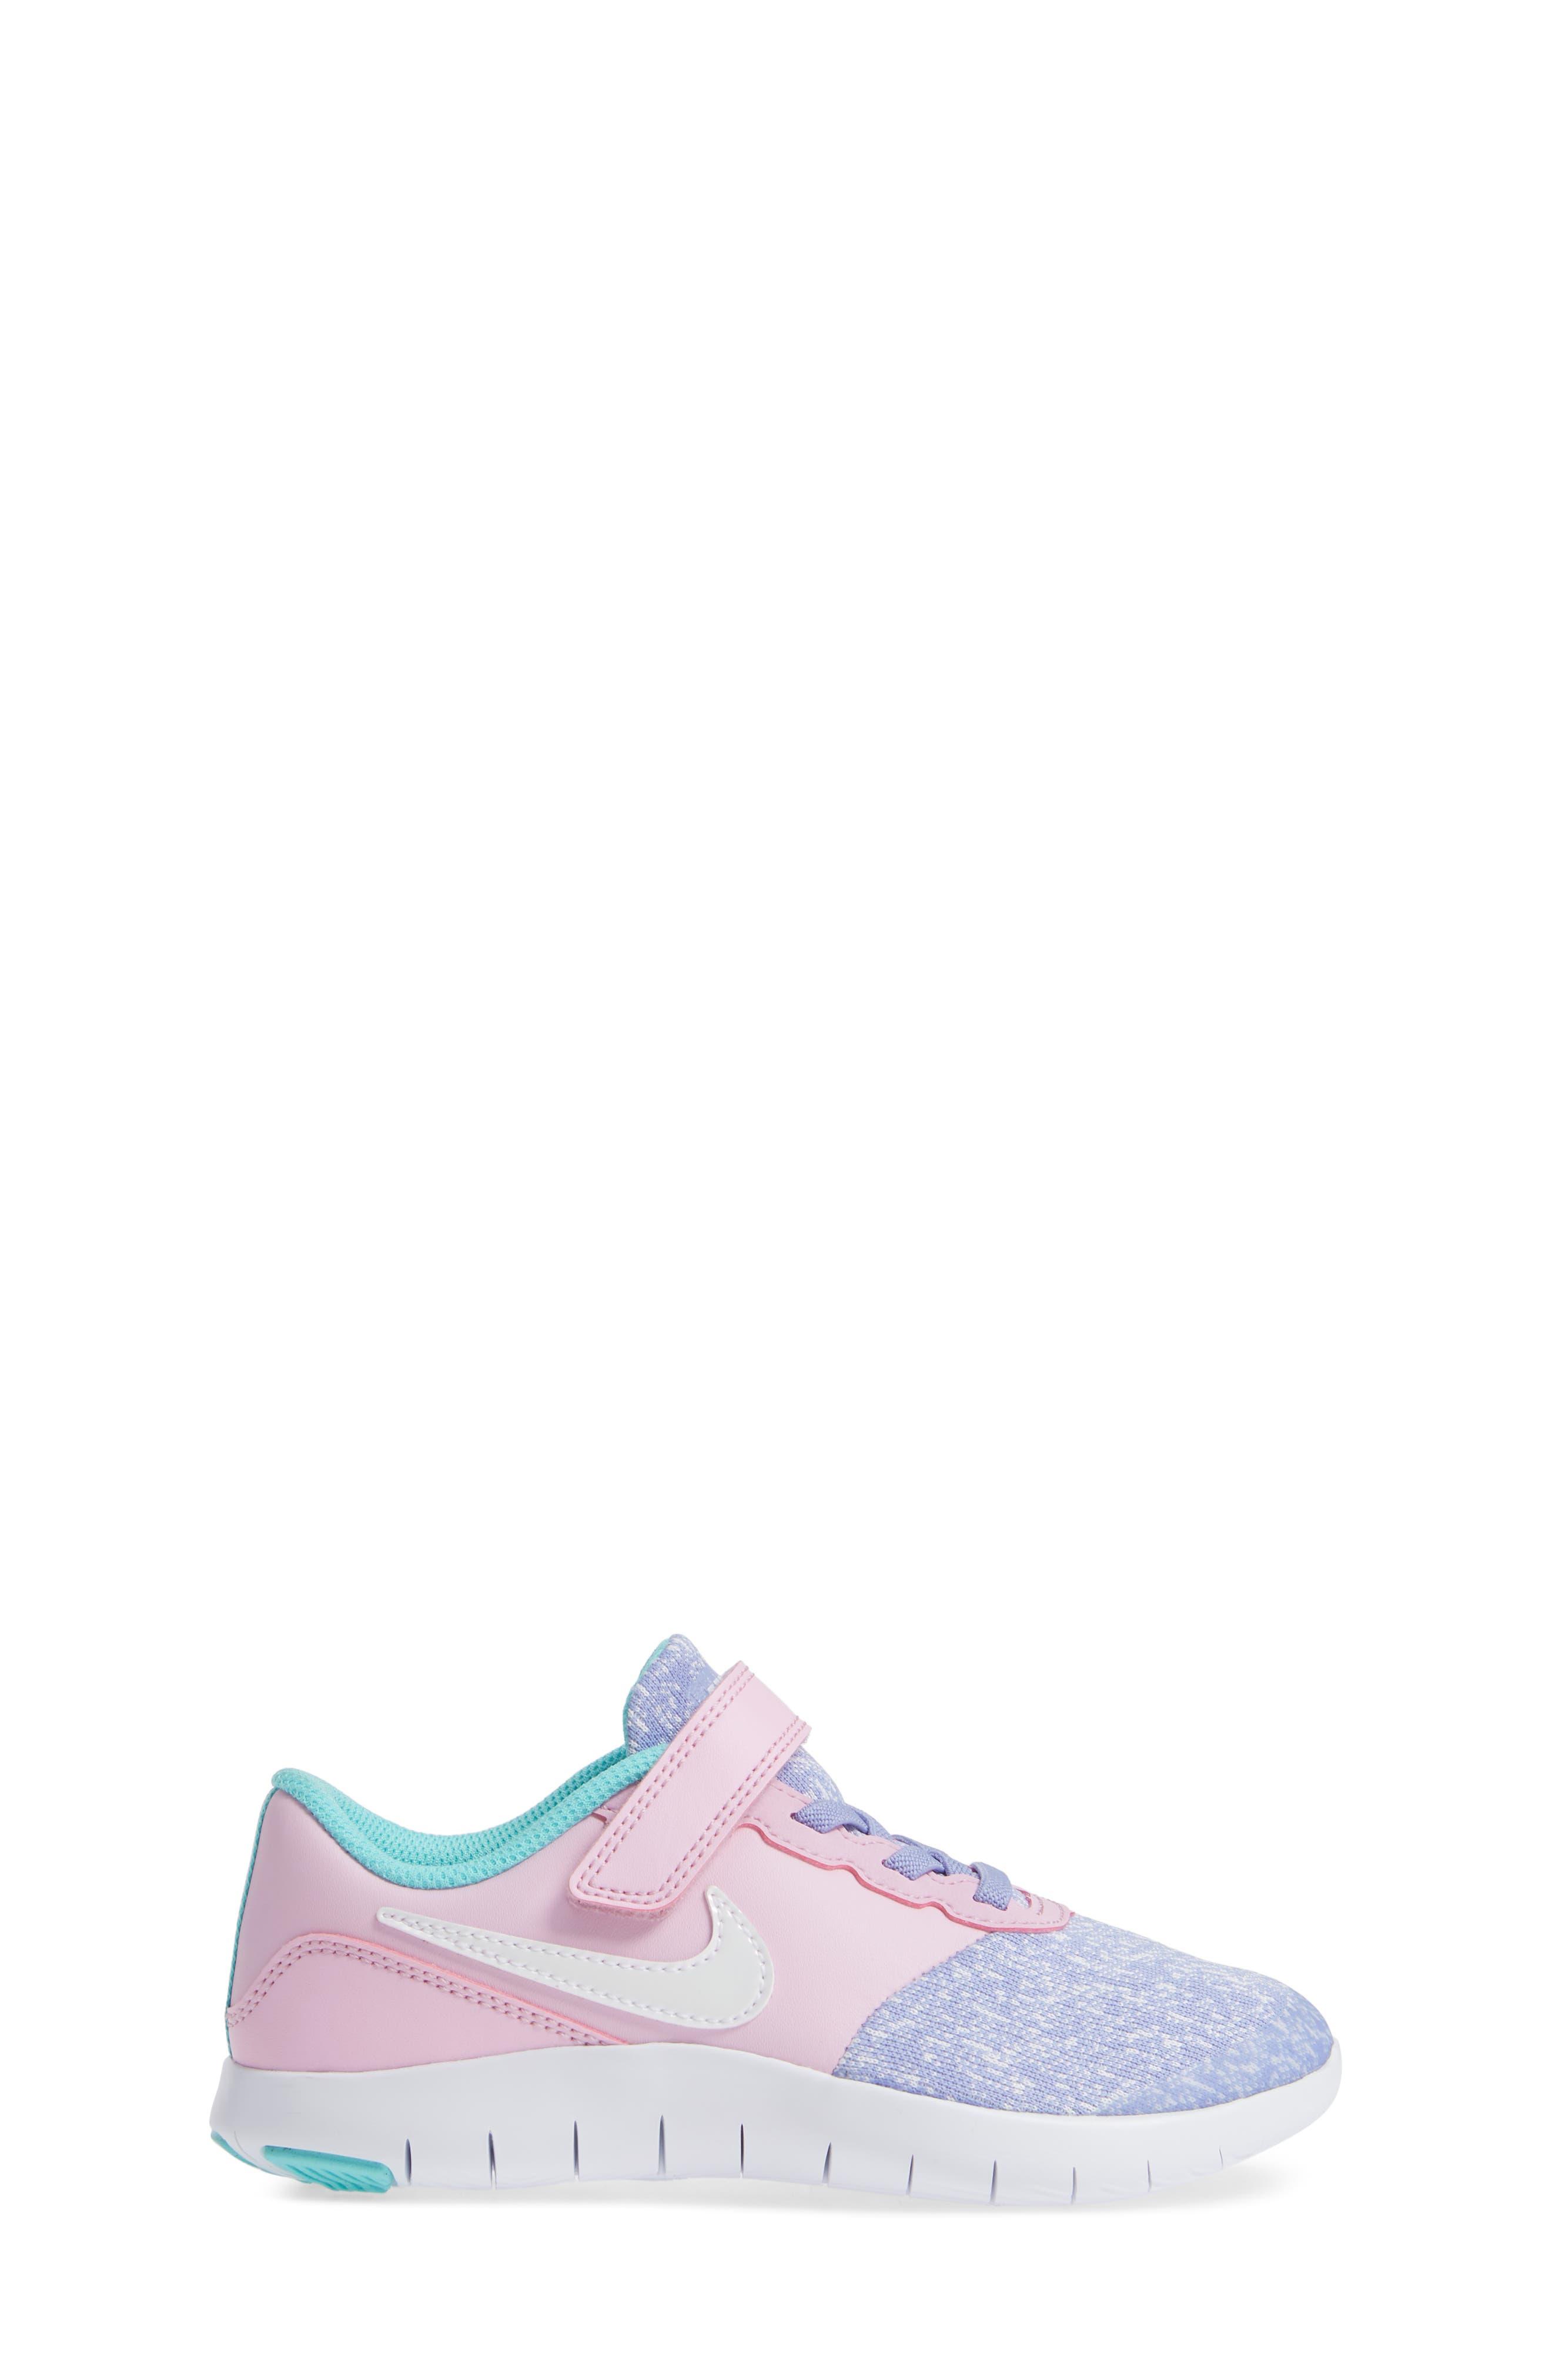 Flex Contact Running Shoe,                             Alternate thumbnail 3, color,                             TWILIGHT PULSE WHITE AQUA